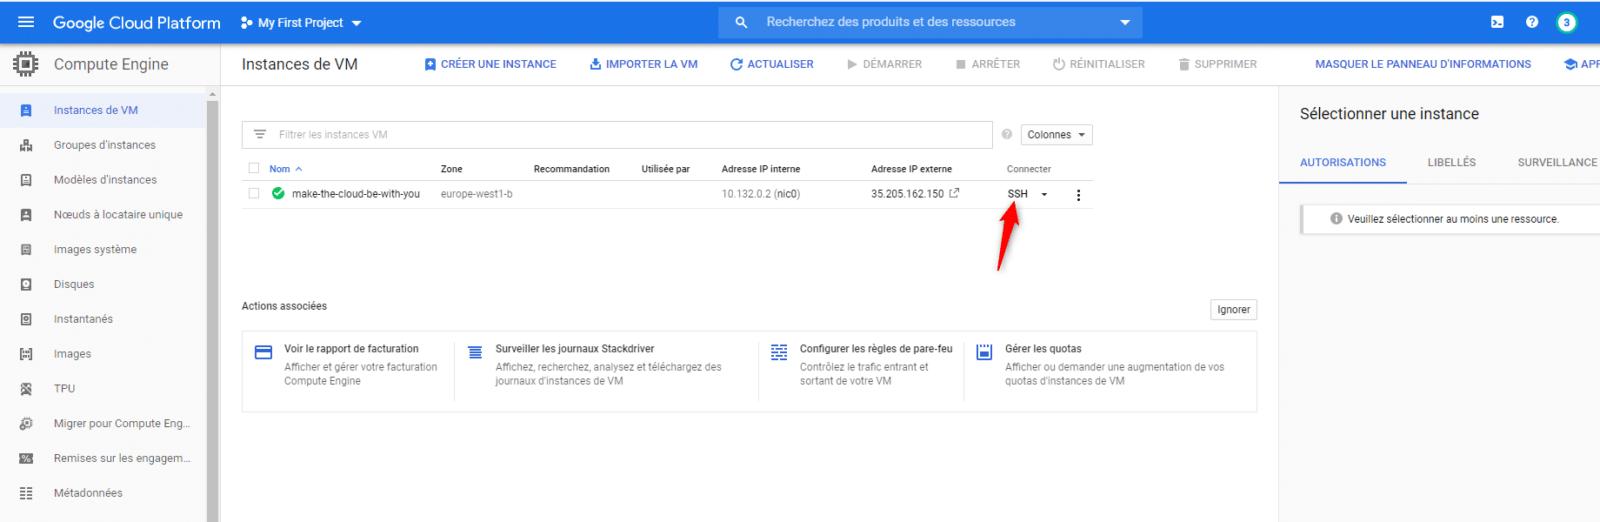 finish the configuration on google cloud platform